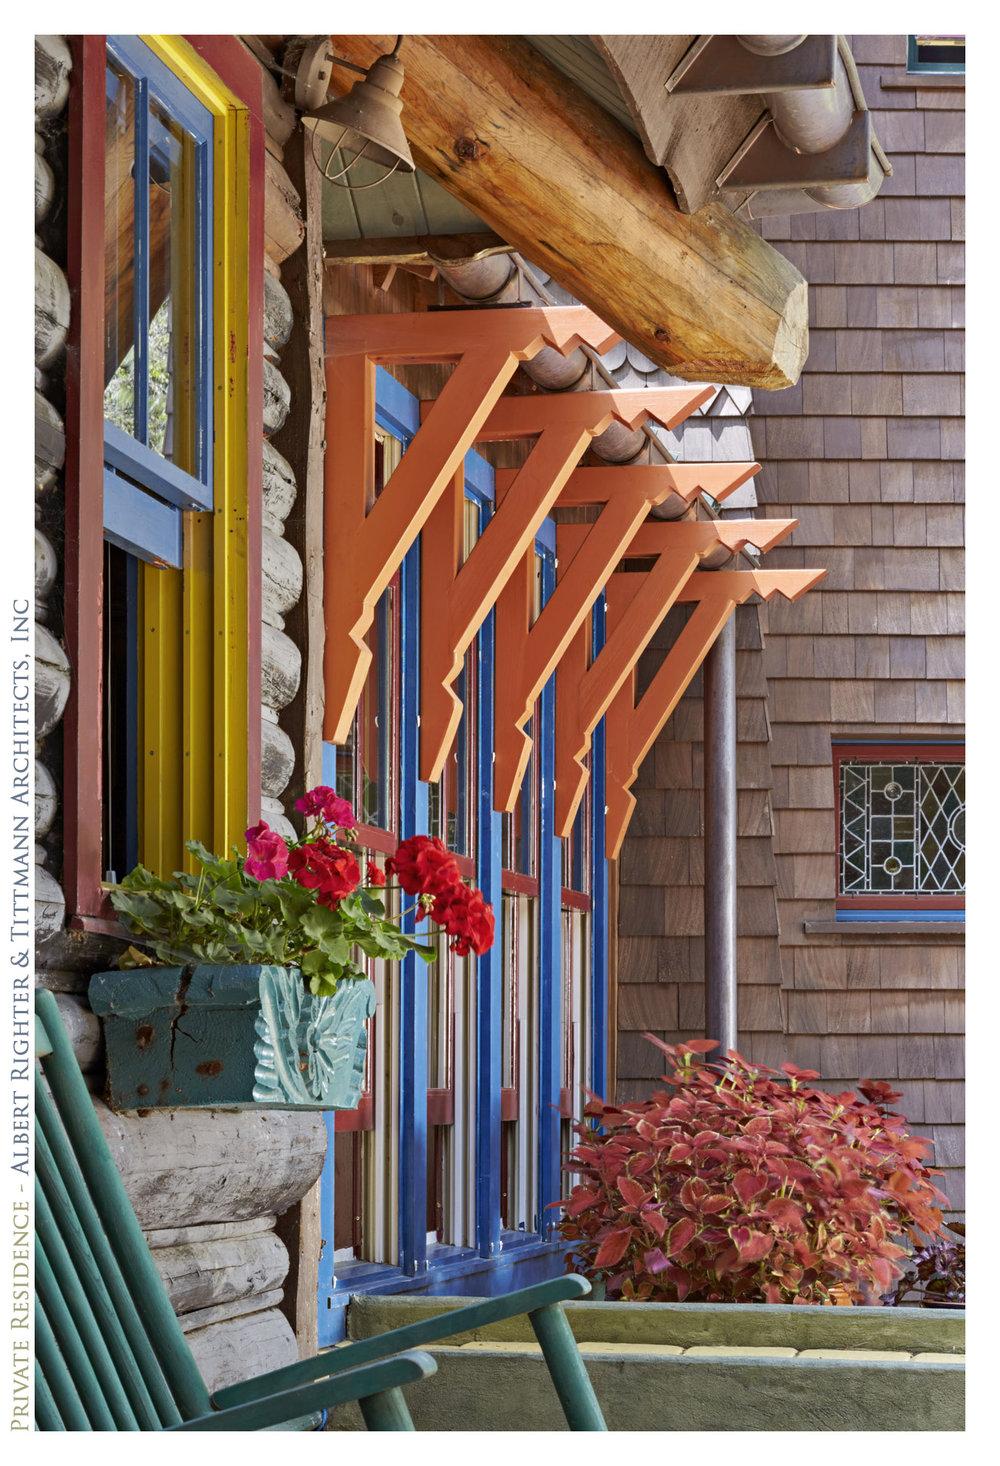 049_Robert-Benson-Photography-Residential-Albert-Righter-Tittmann-Architects-04.JPG